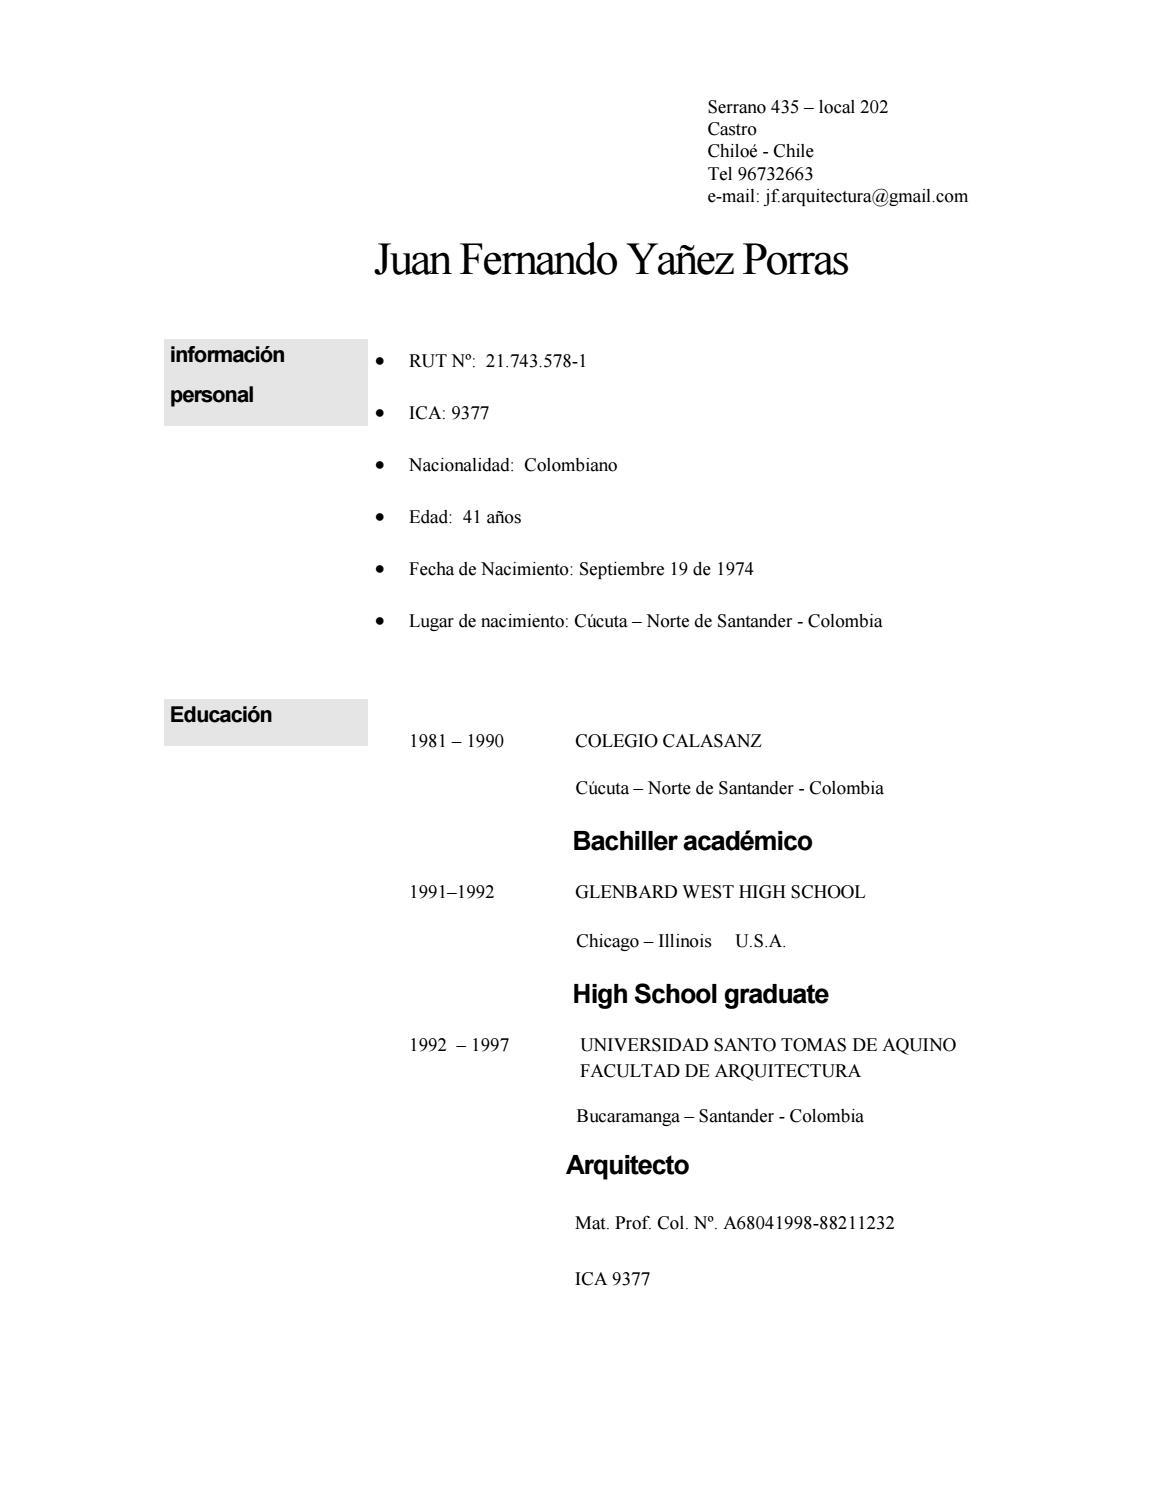 Curriculum Vitae Juan Fernando Yañez by jorge inostroza - issuu